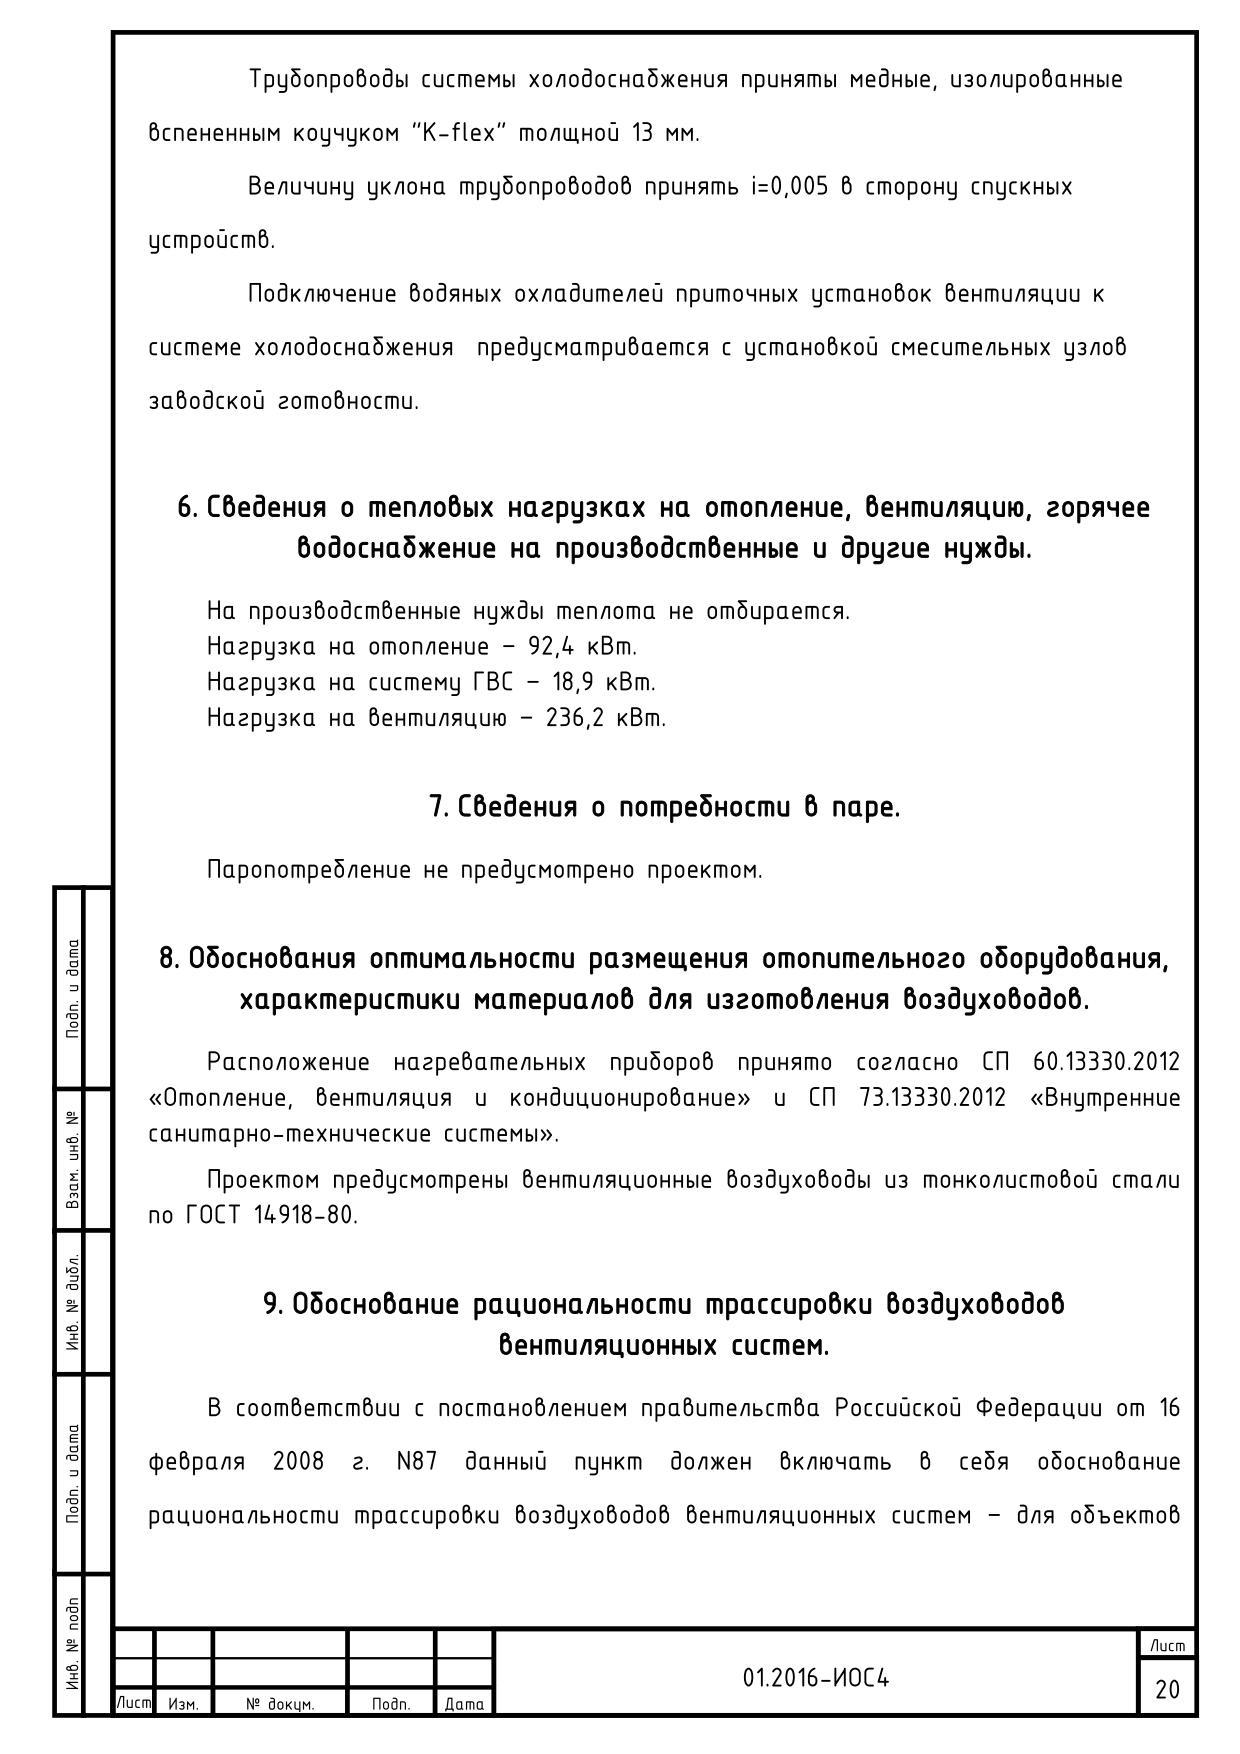 Депо 12-37-0021